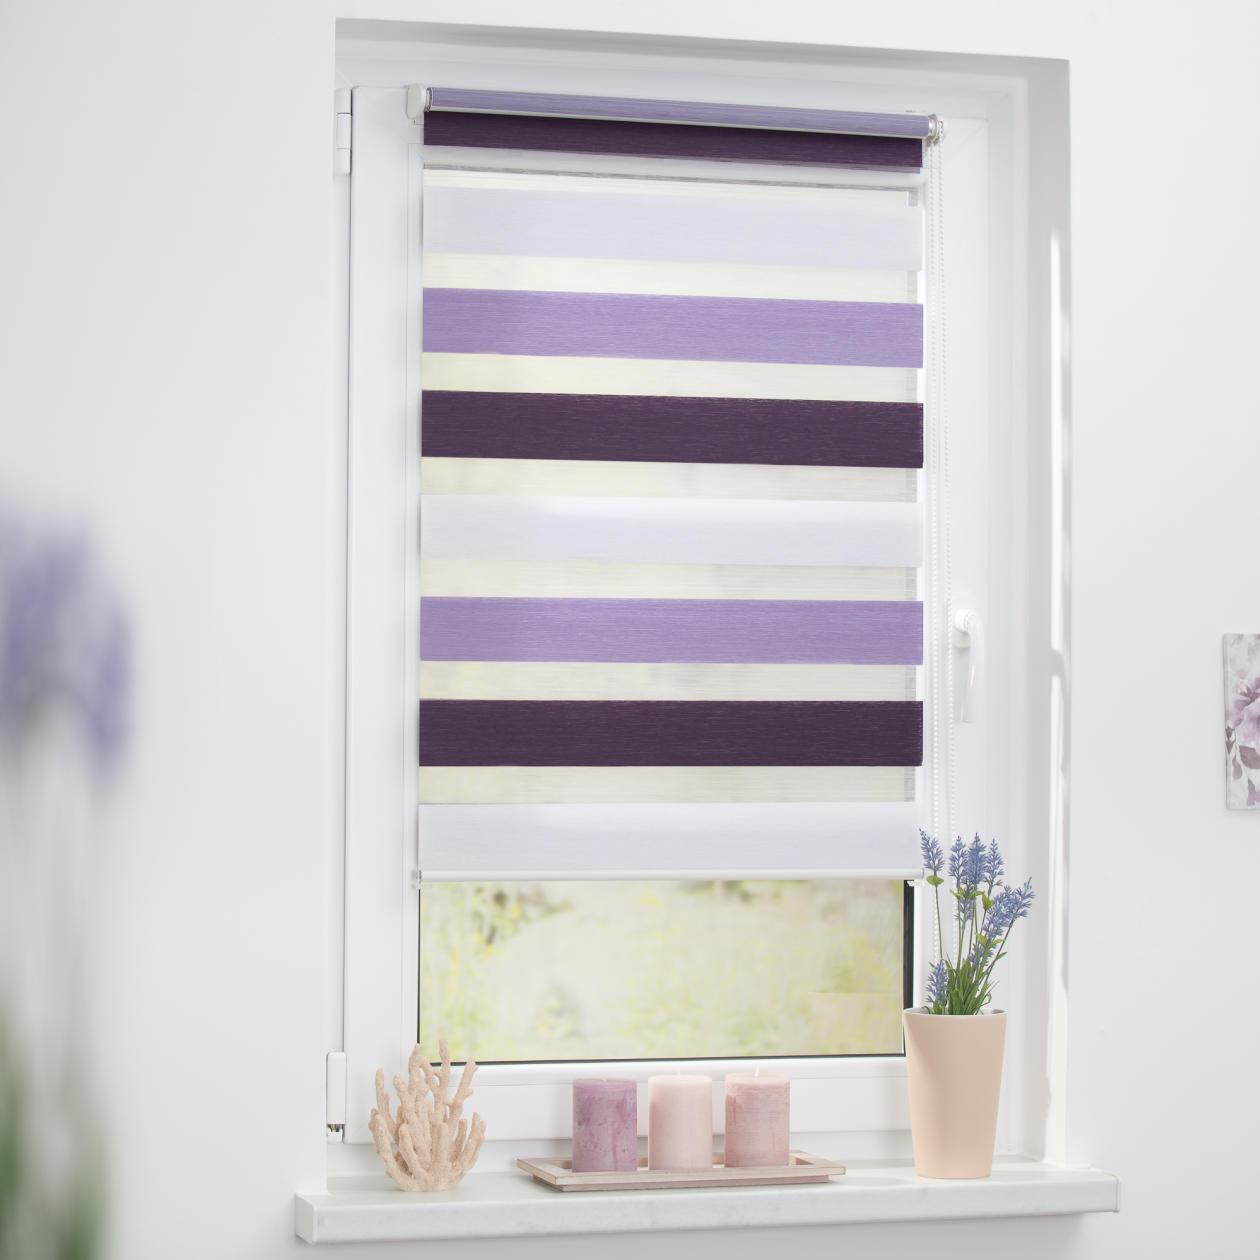 lichtblick duo rollo klemmfix ohne bohren bunt. Black Bedroom Furniture Sets. Home Design Ideas